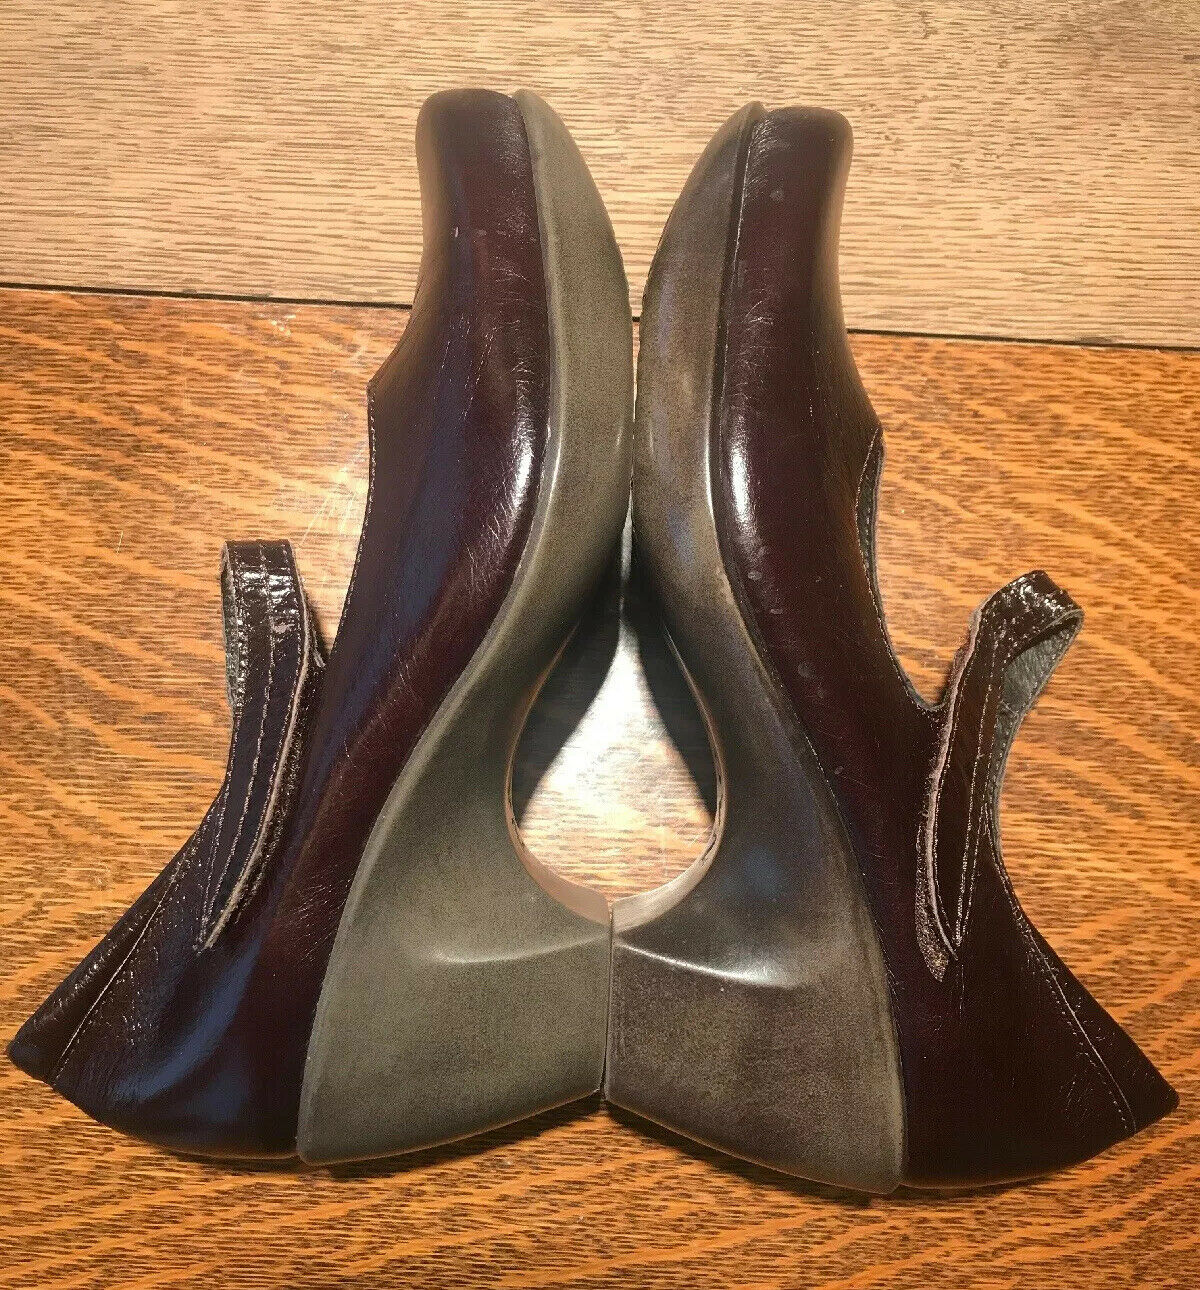 Naot Pleasure Mary Jane Wedge Heel Brown Size EU 36 L5 US 5-5.5 Bow Comfort